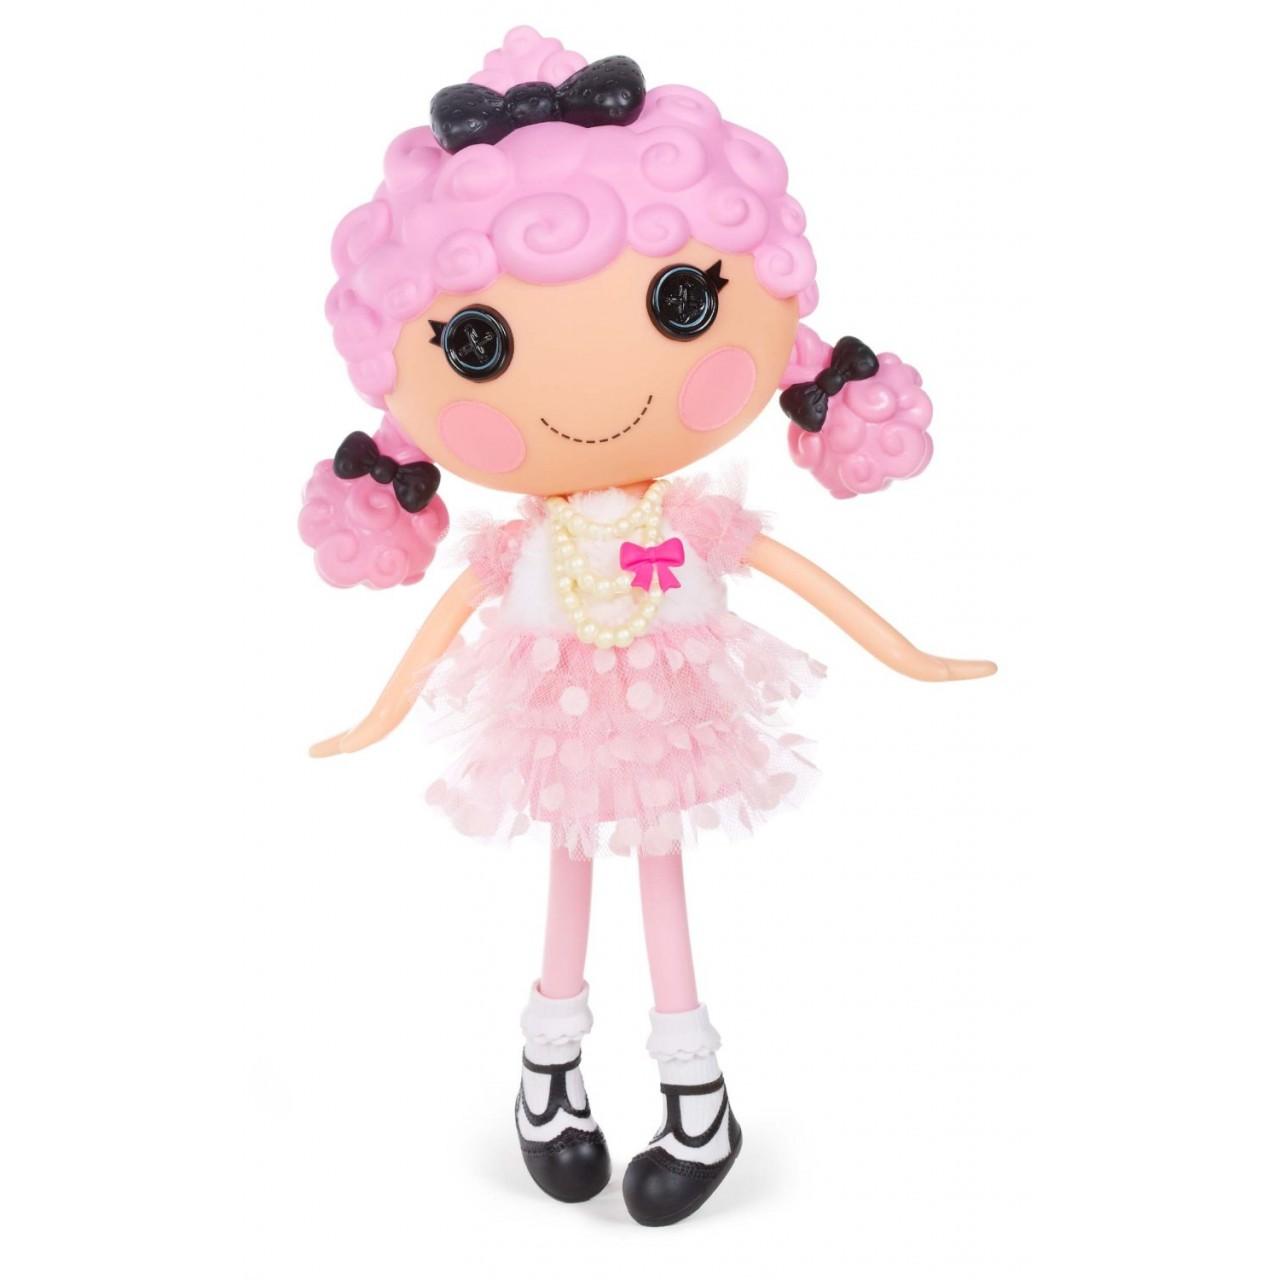 Кукла Lalaloopsy большая - Вишенка,  536192